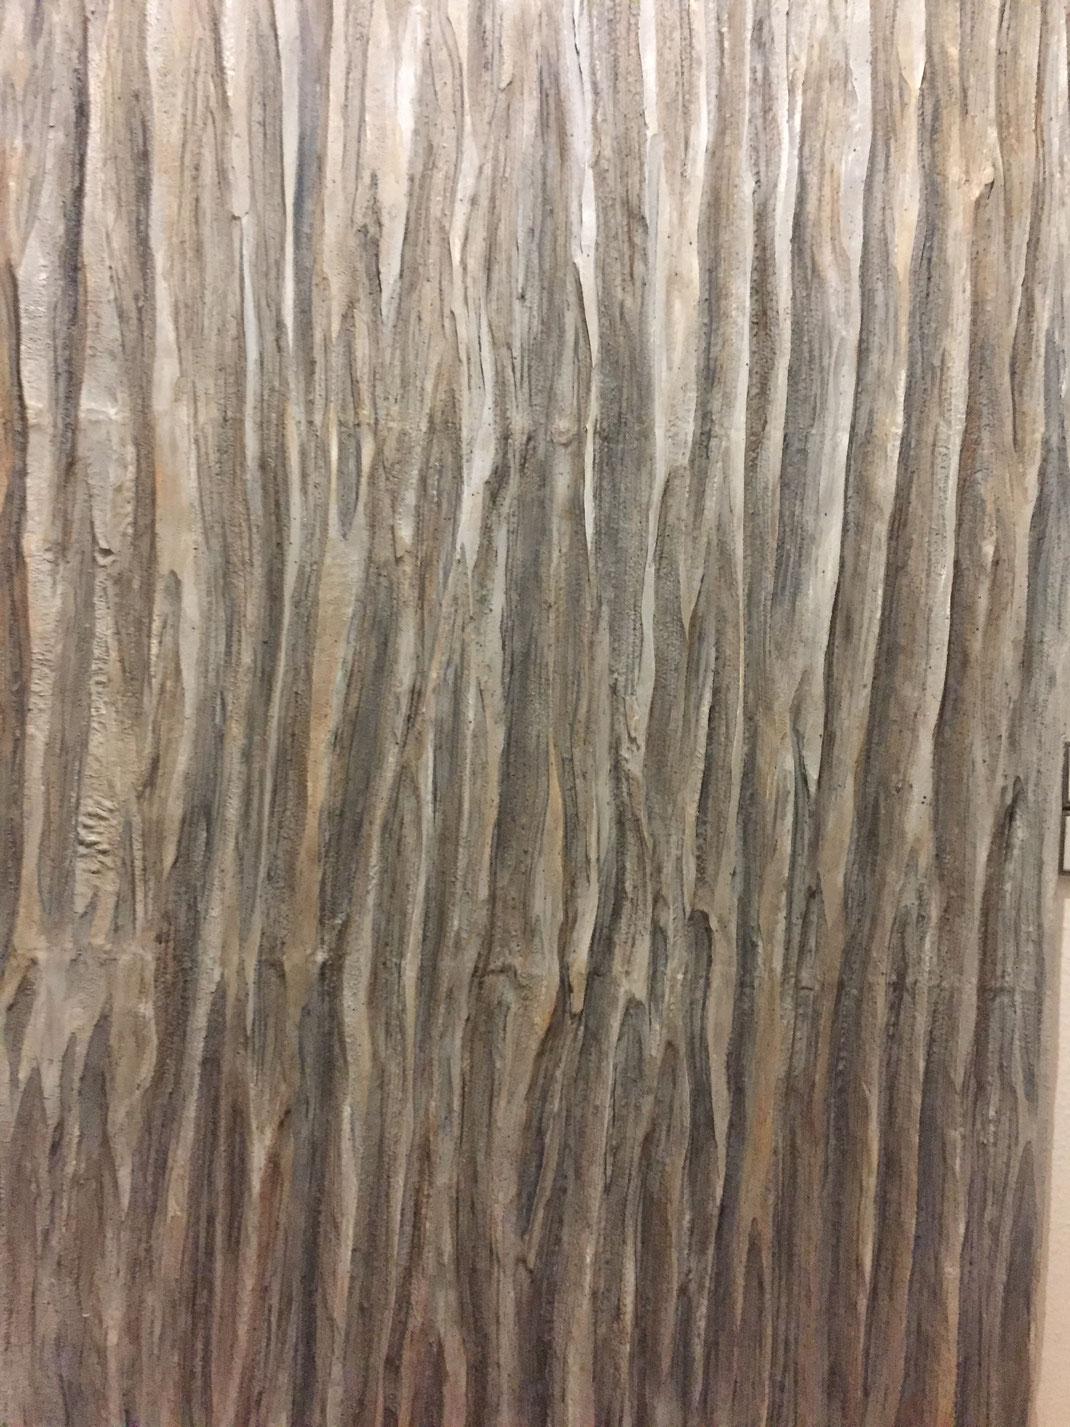 Foam Board made to look like wood.